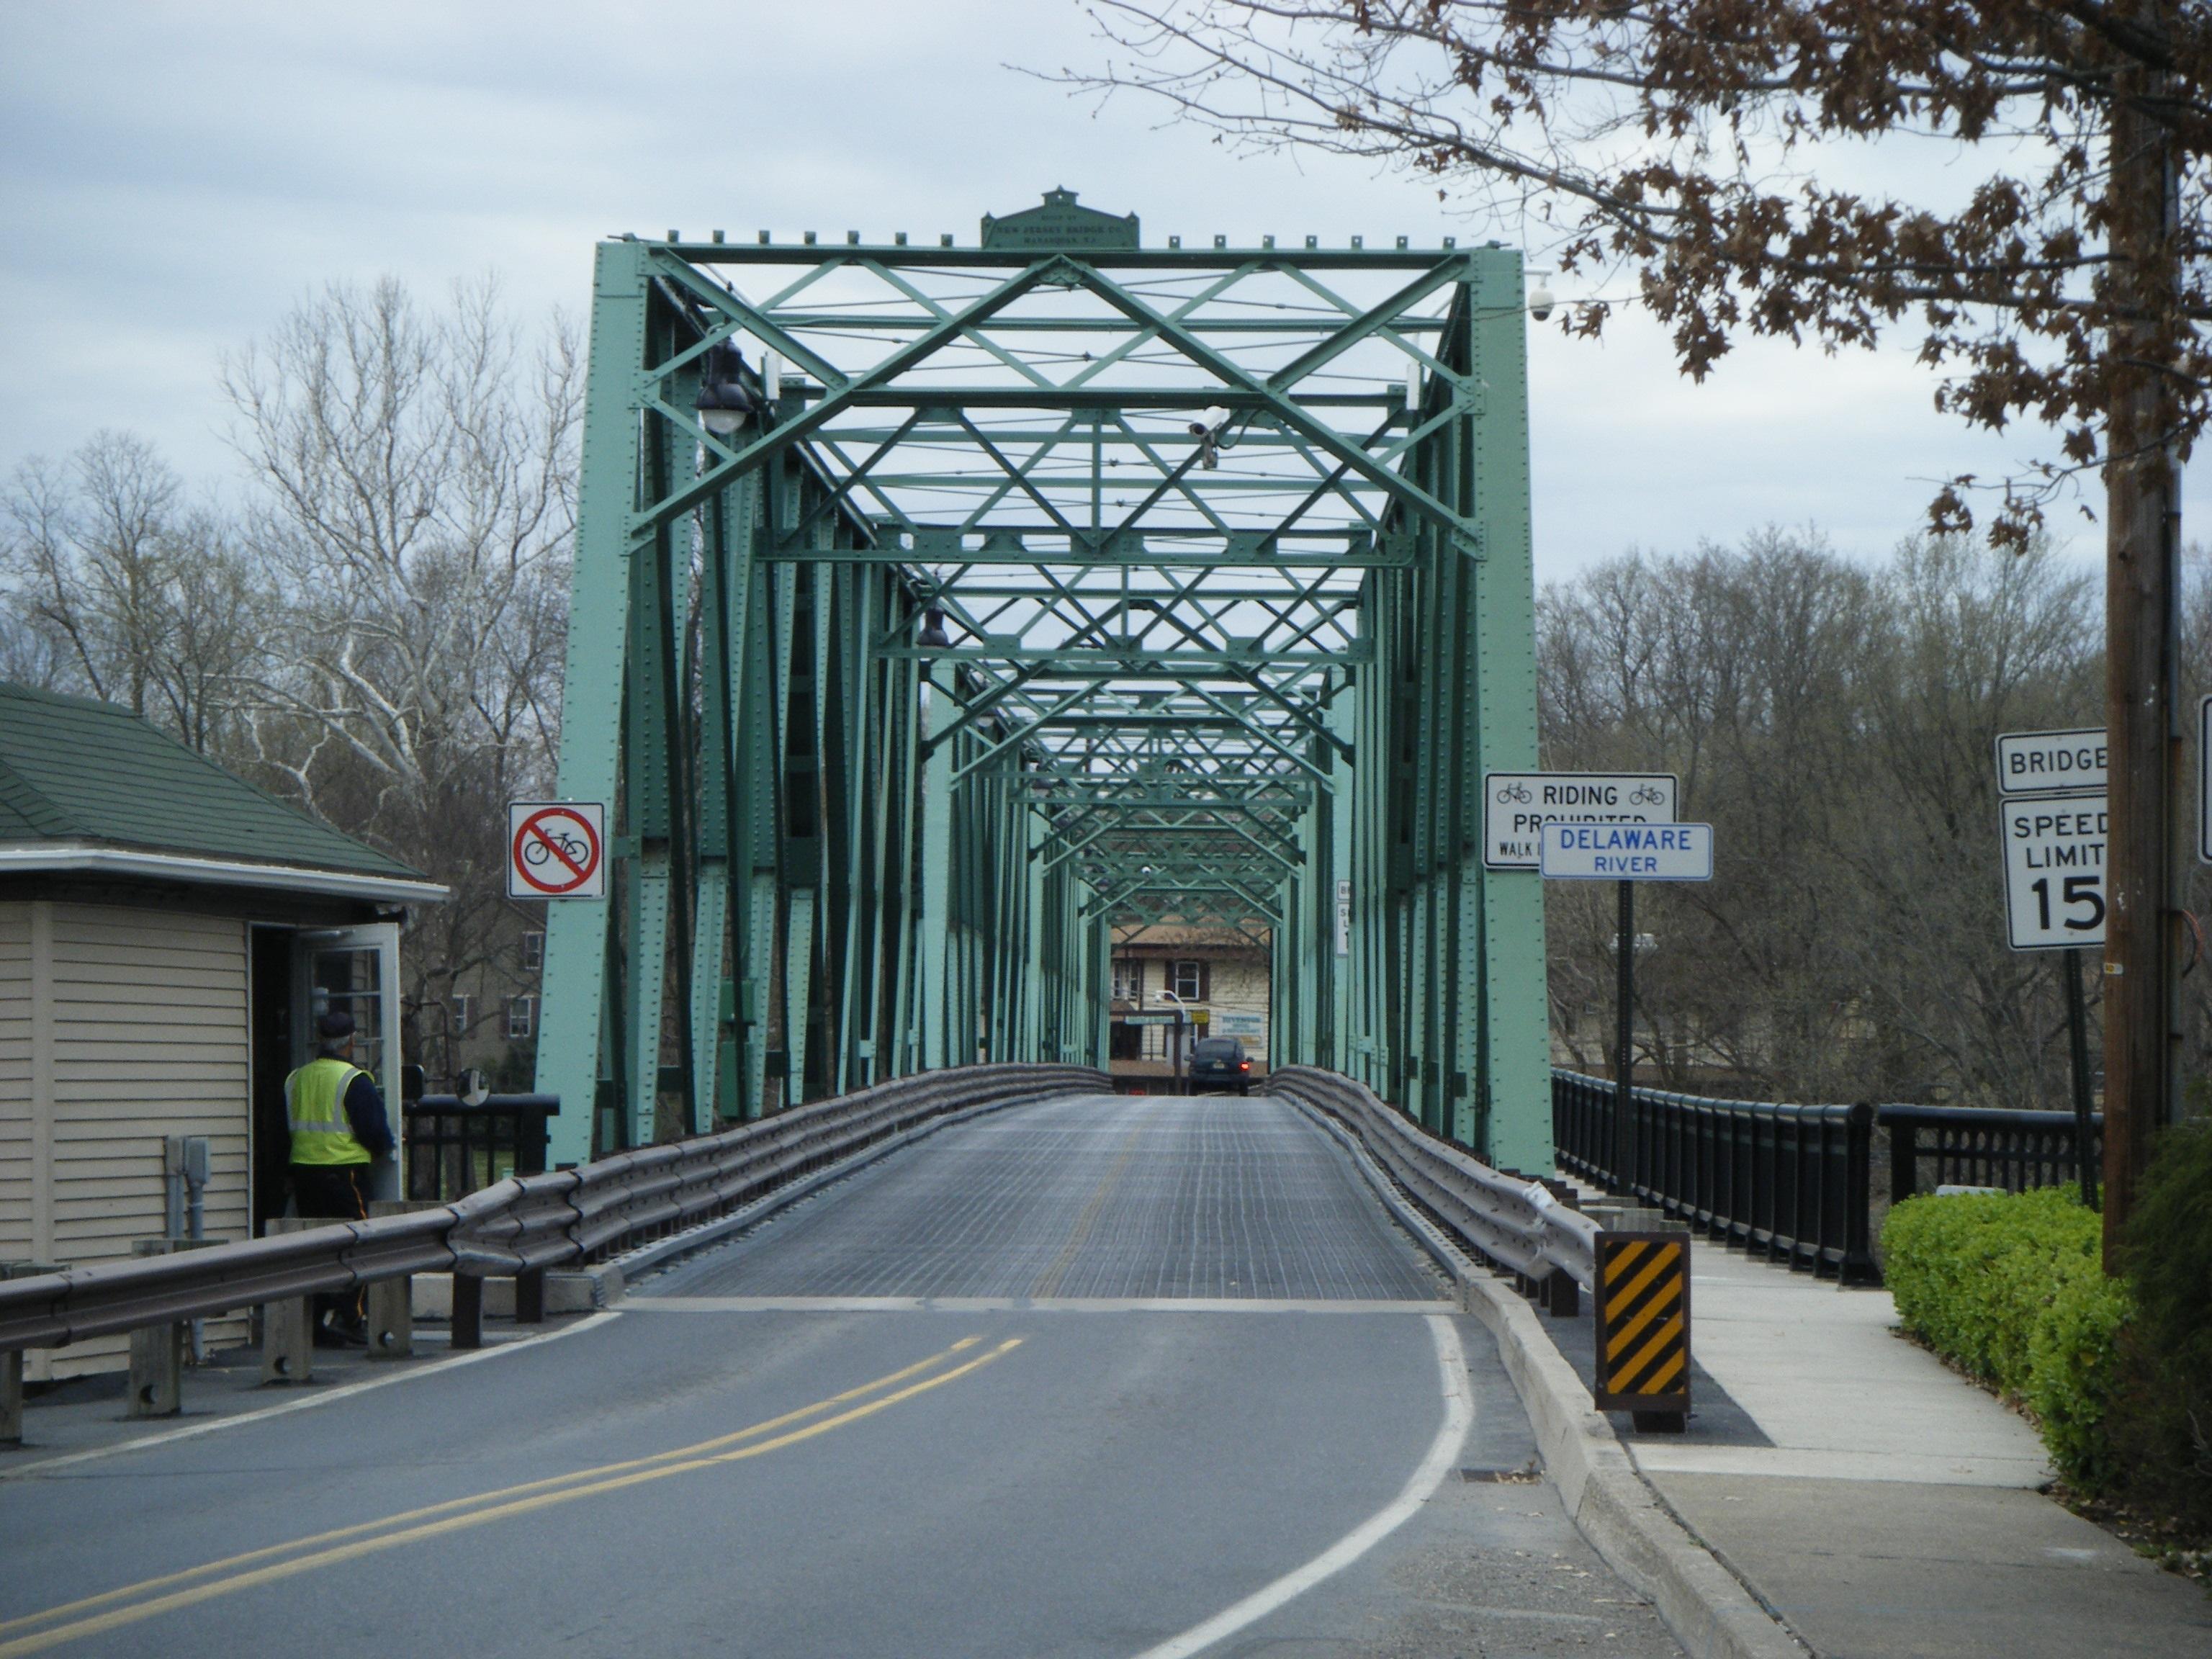 Riverton belvidere bridge for The riverton